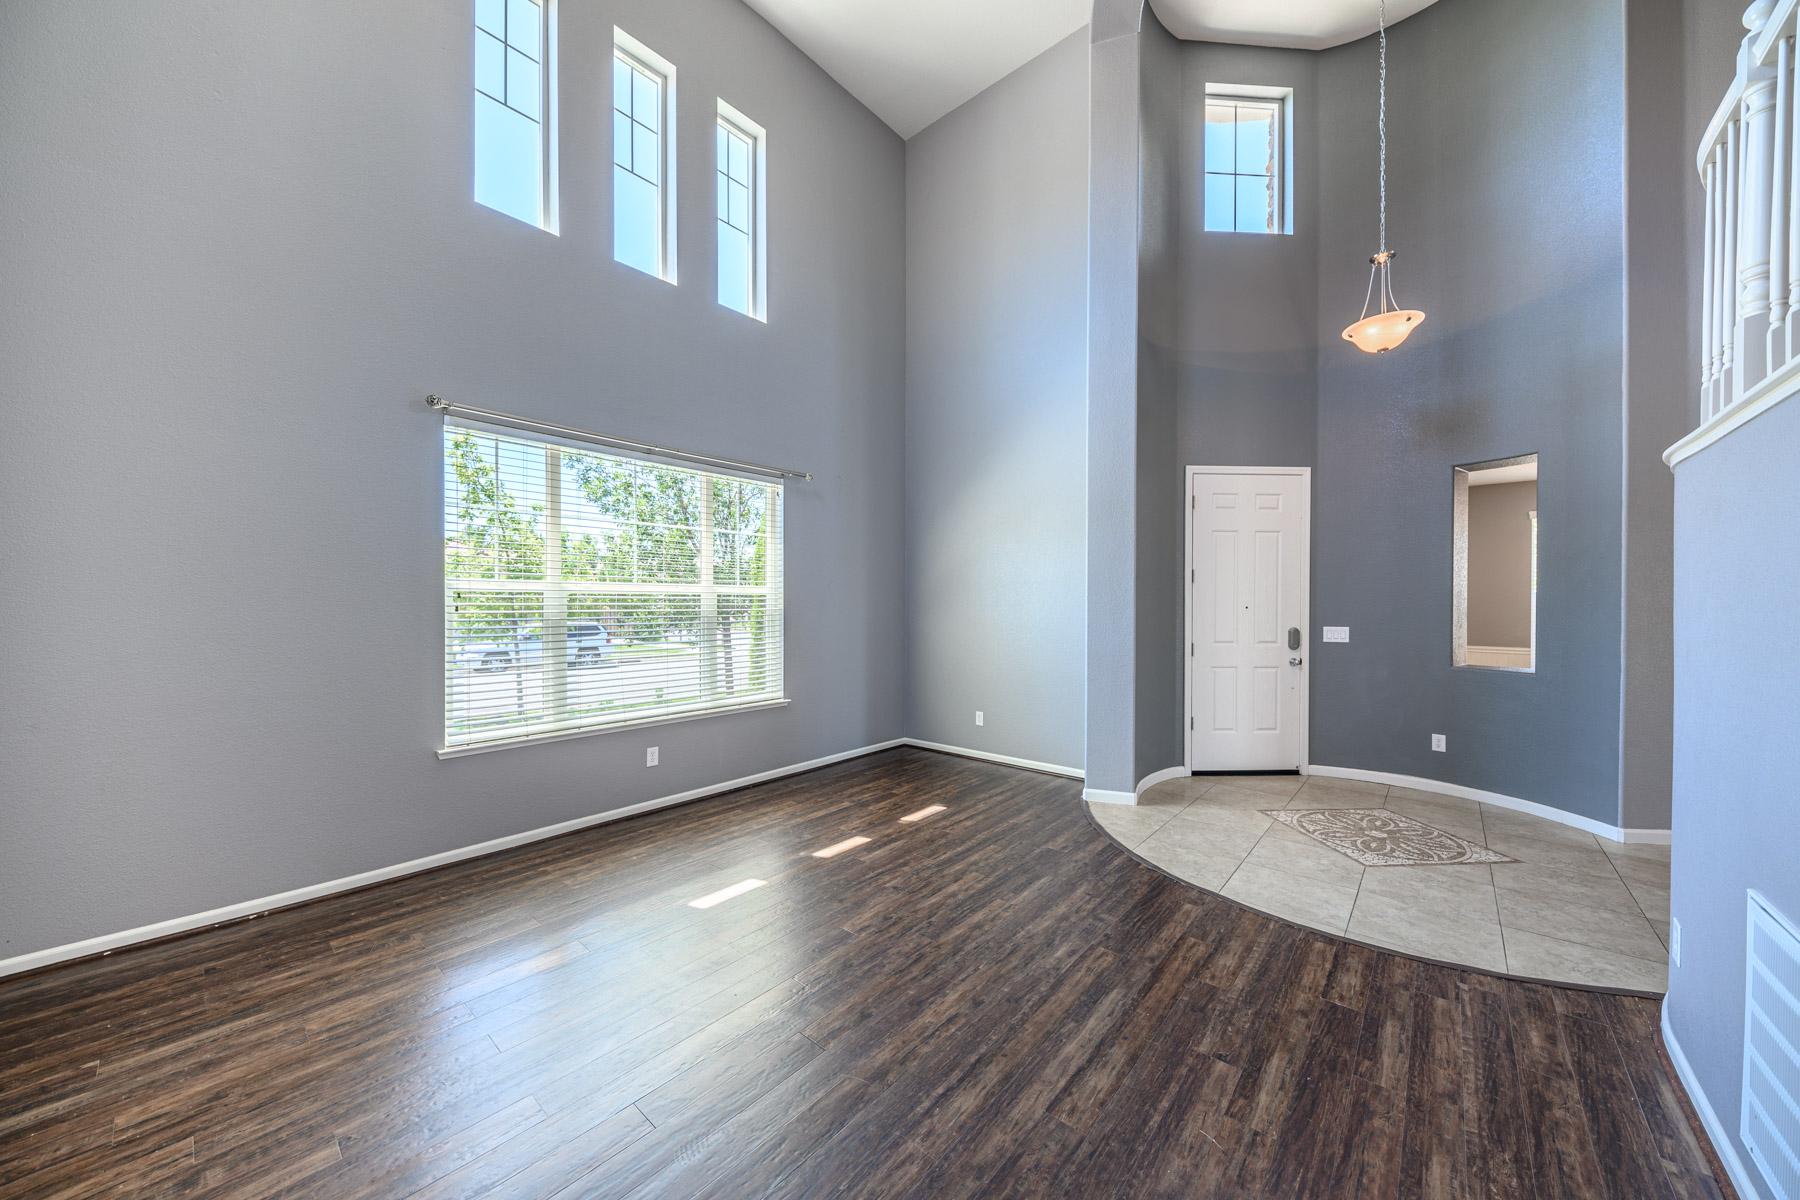 Additional photo for property listing at 6571 Voyage Drive, Sparks, NV 6571 Voyage Drive 斯帕克斯, 内华达州 89436 美国